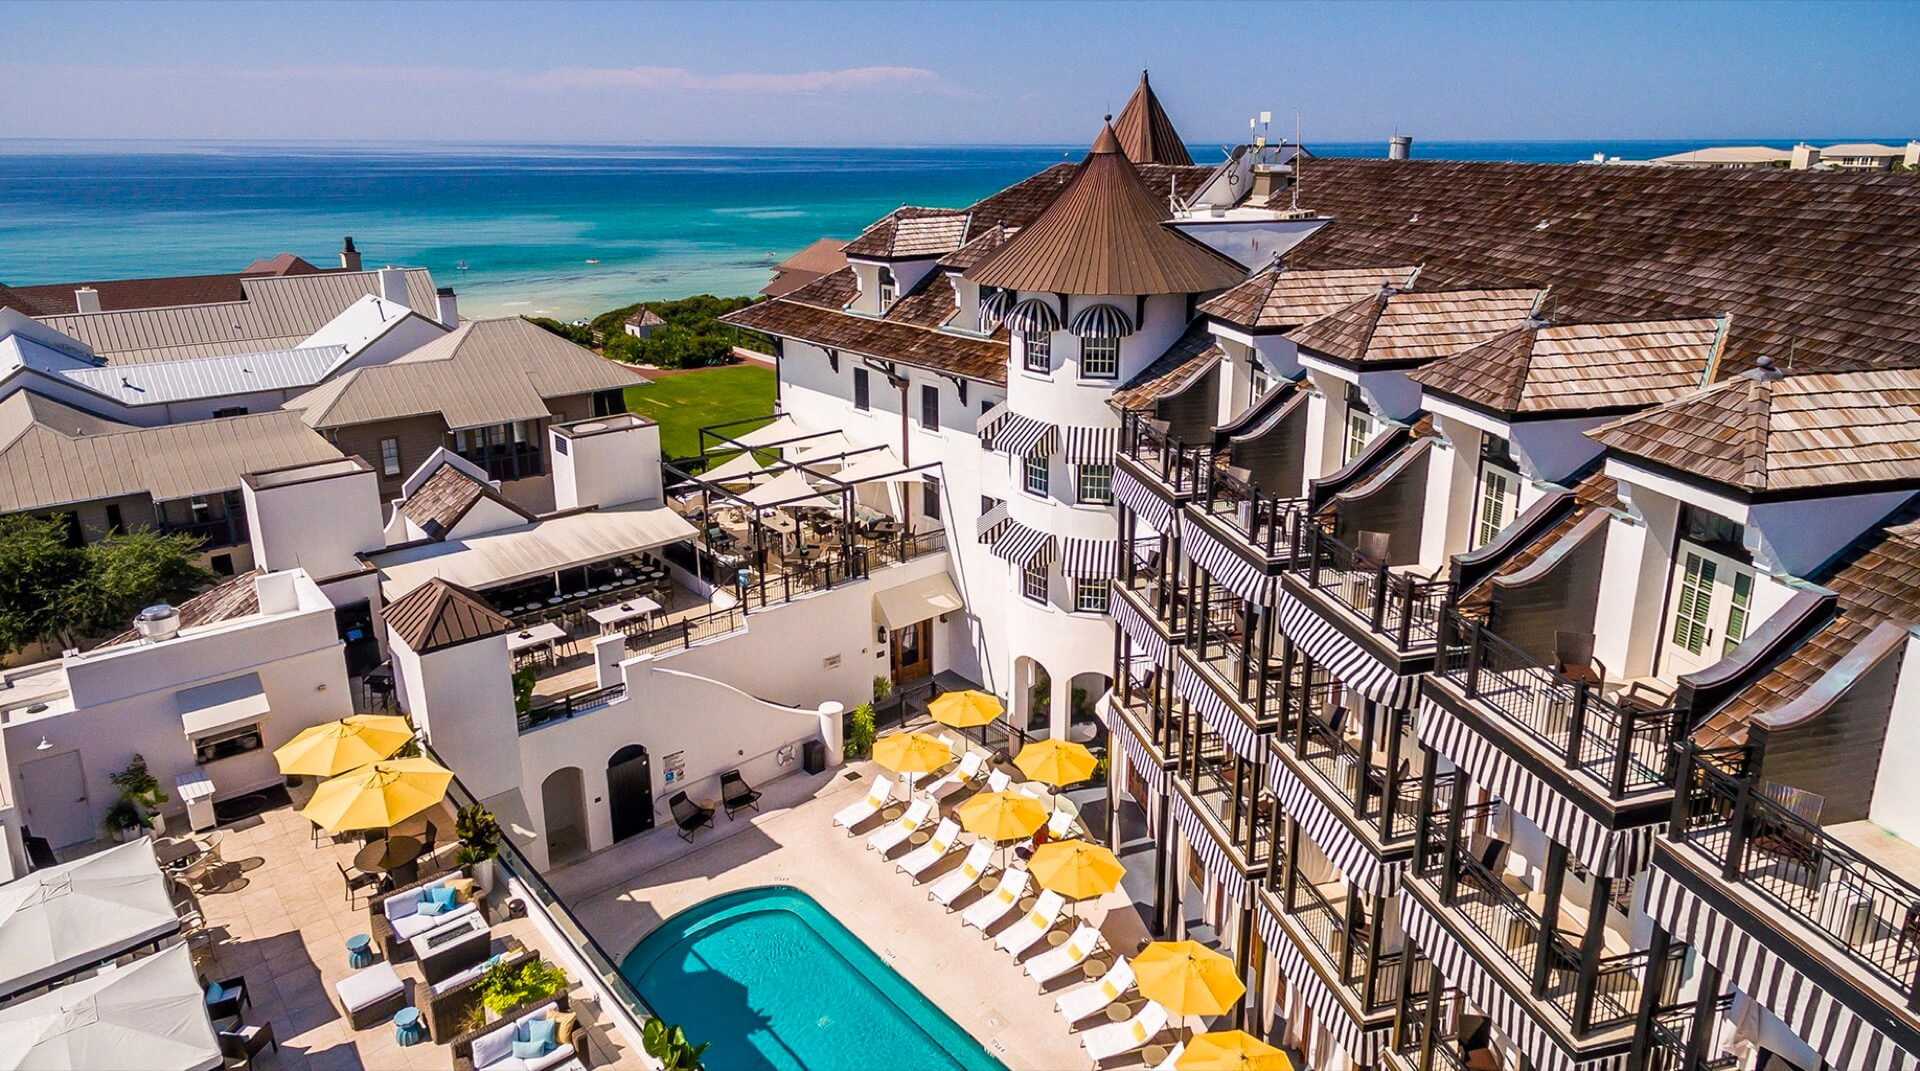 The Pearl Hotel - Rosemary Beach